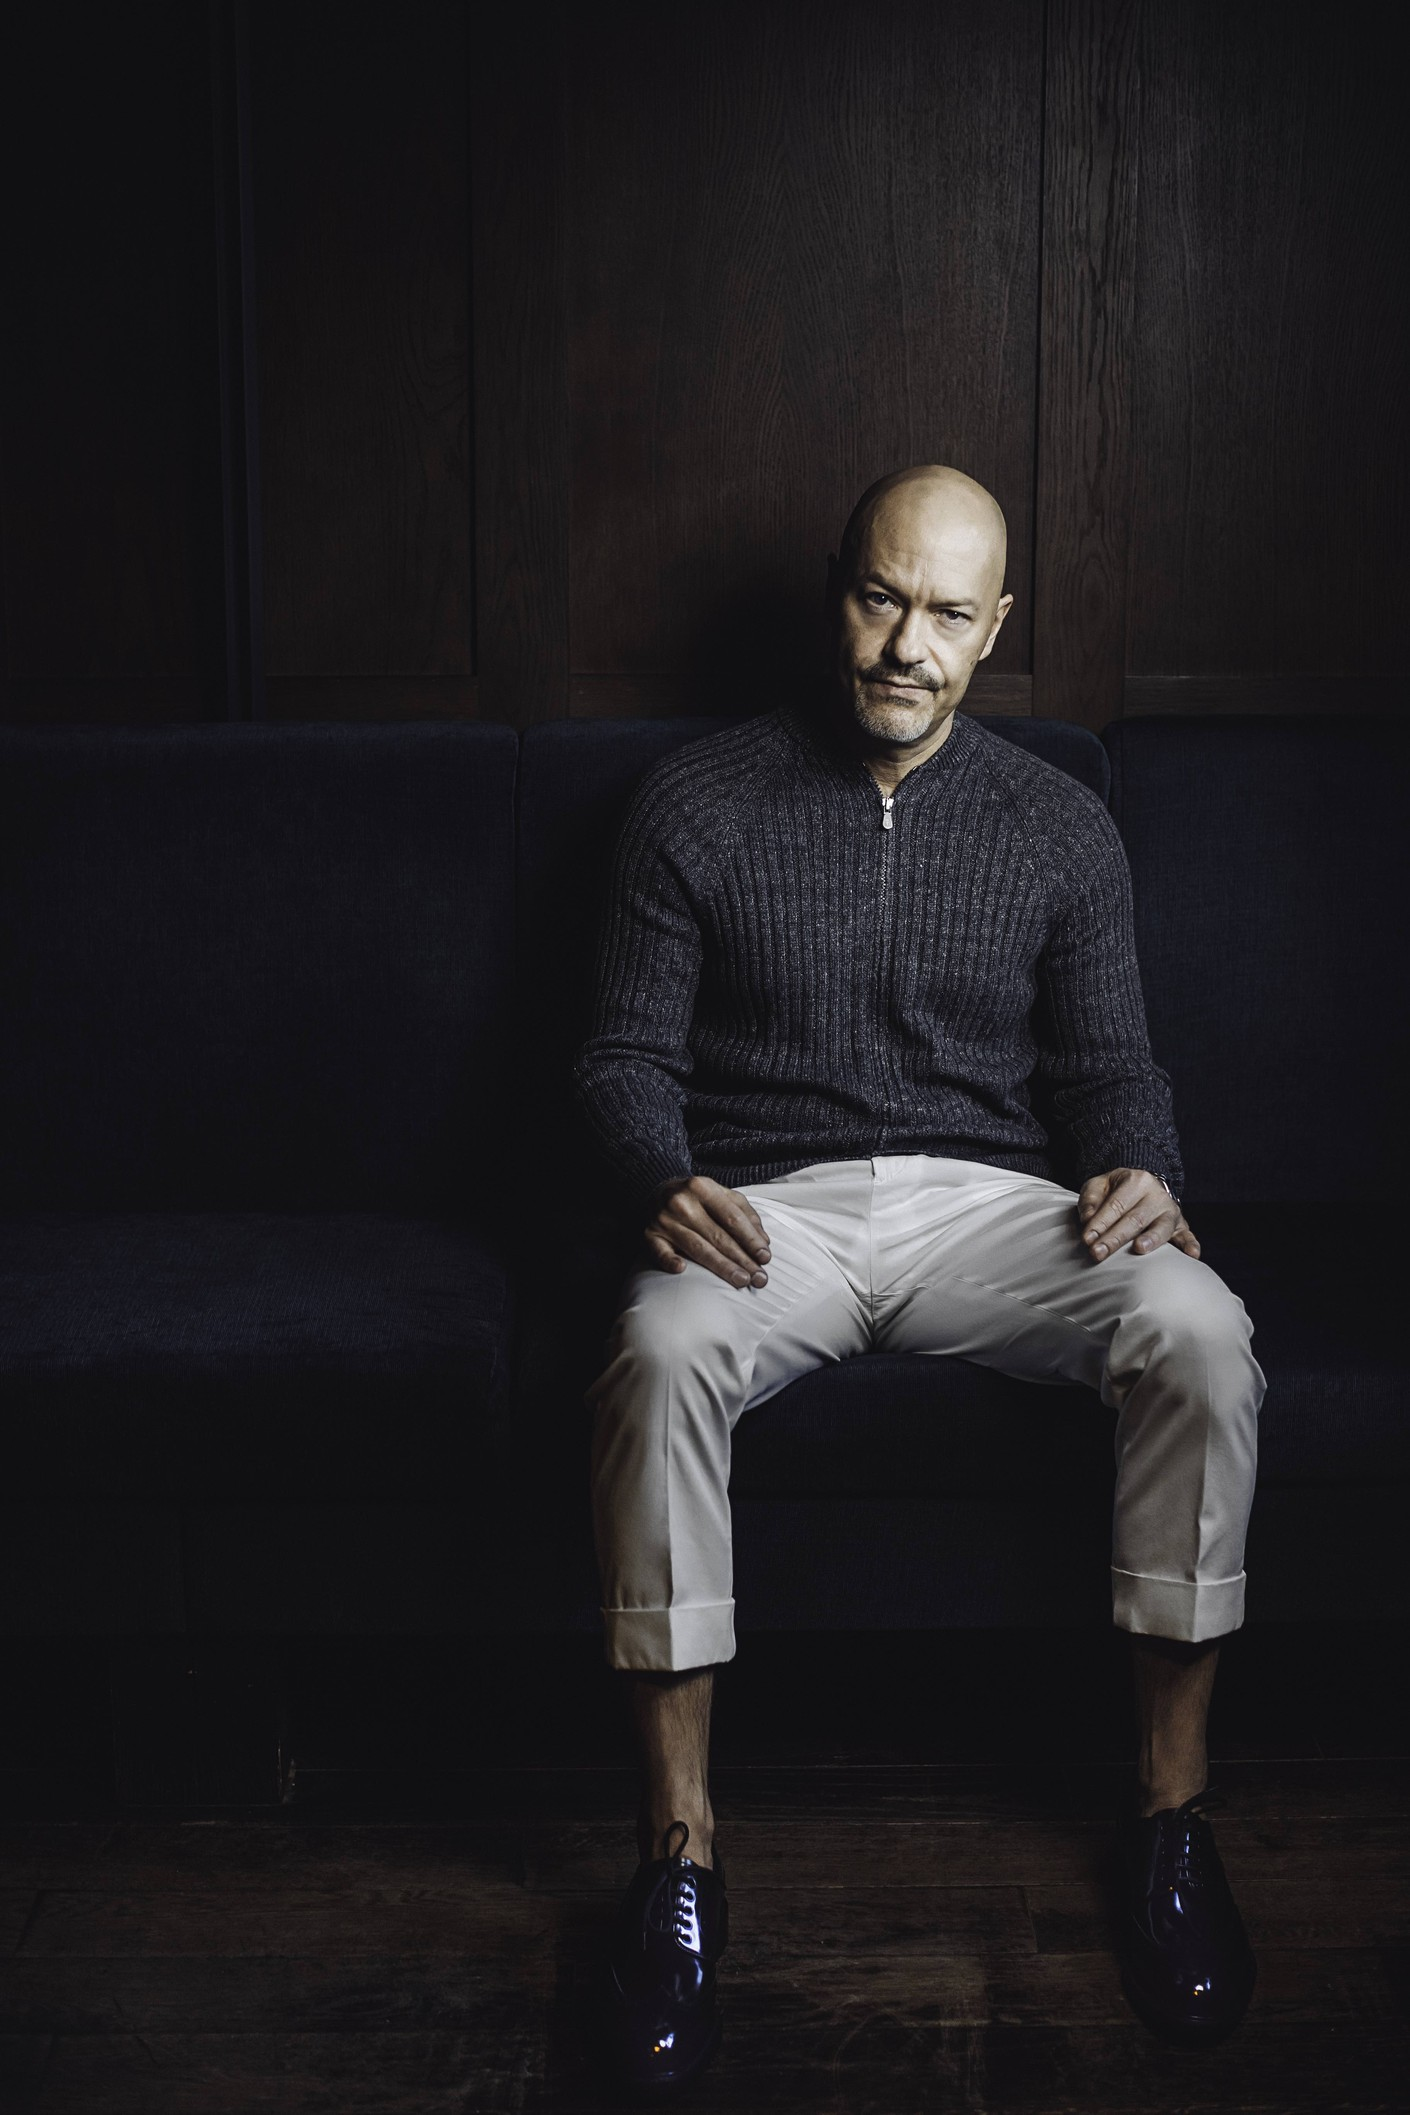 Кардиган, брюки Brunello Cucinelli, ботинки Prada